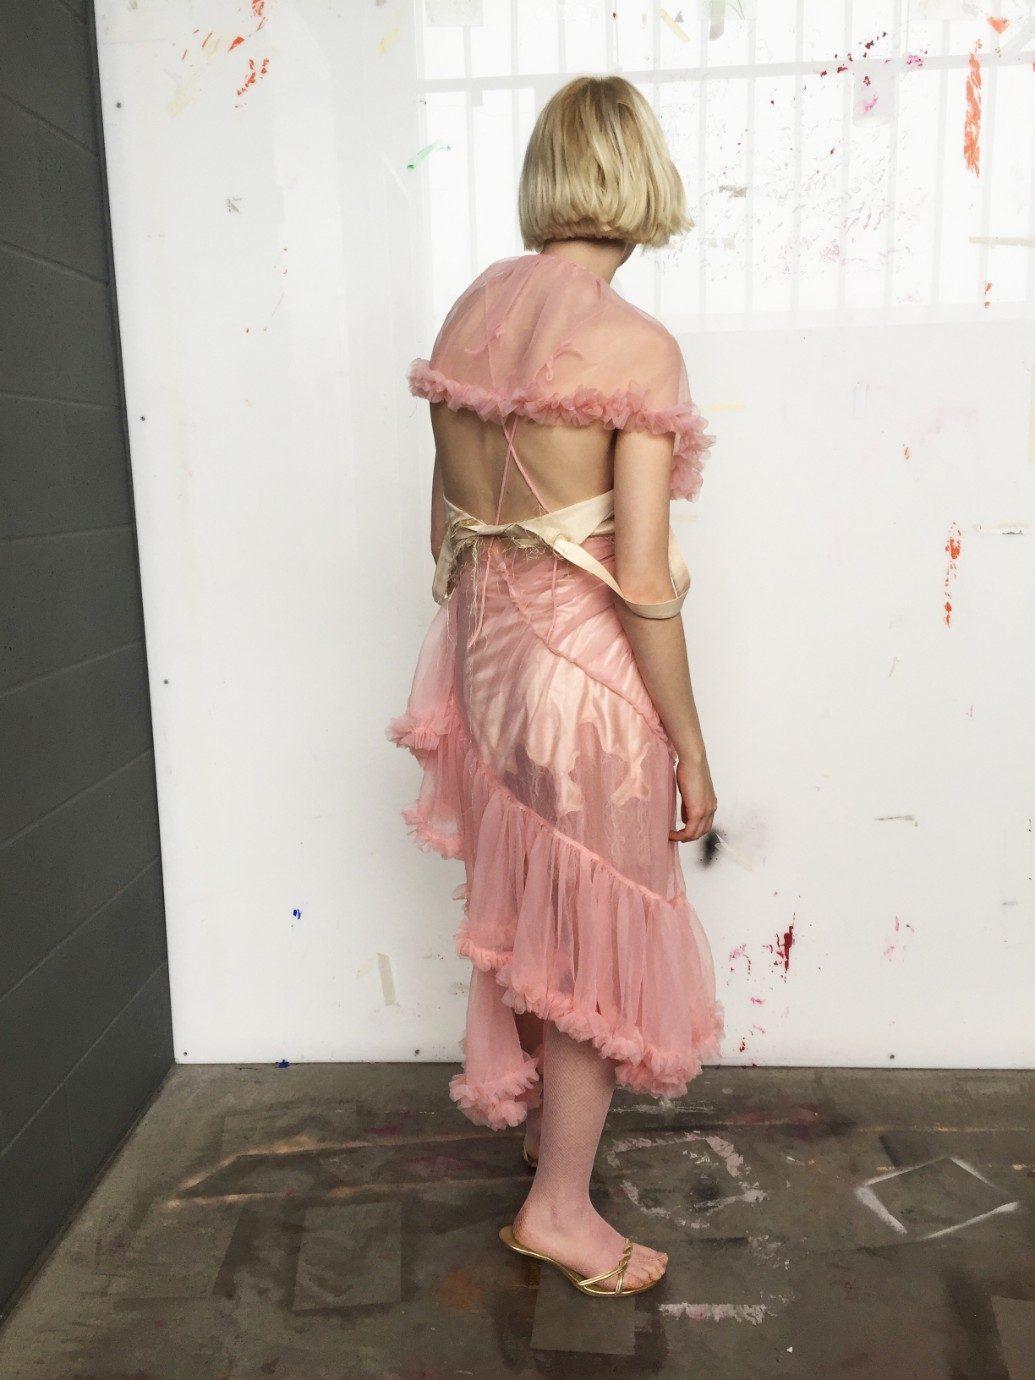 bodegathirteen_monday_mood_pink_dress.jpg